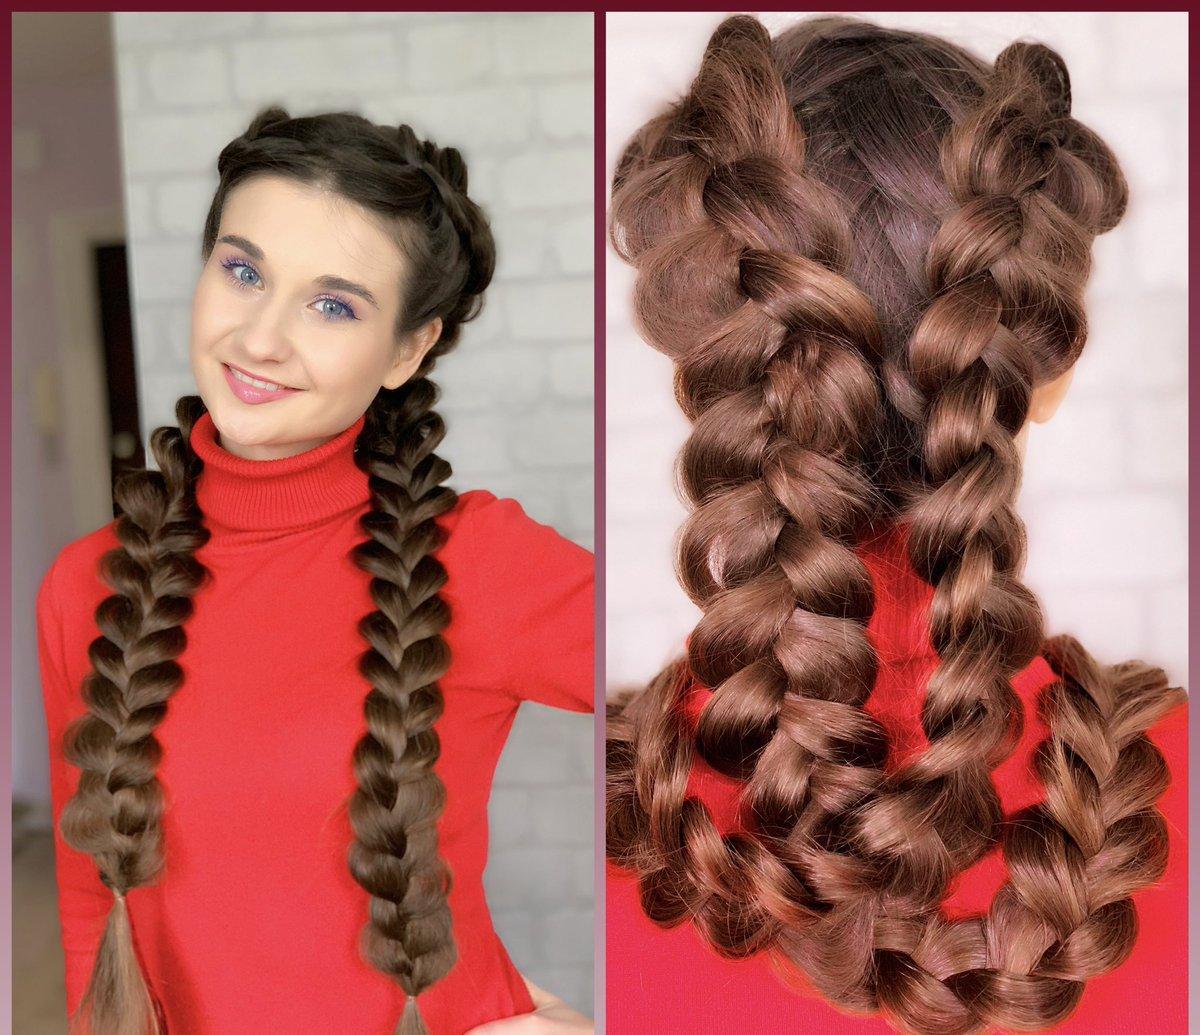 Nice braids by @julia_dubai_hairstylist  #longhairstyle #longhair #hairbraids #braids #thickbraids #hair #brunette #longhairdontcare #hairdresspic.twitter.com/KXKn5xVbpL